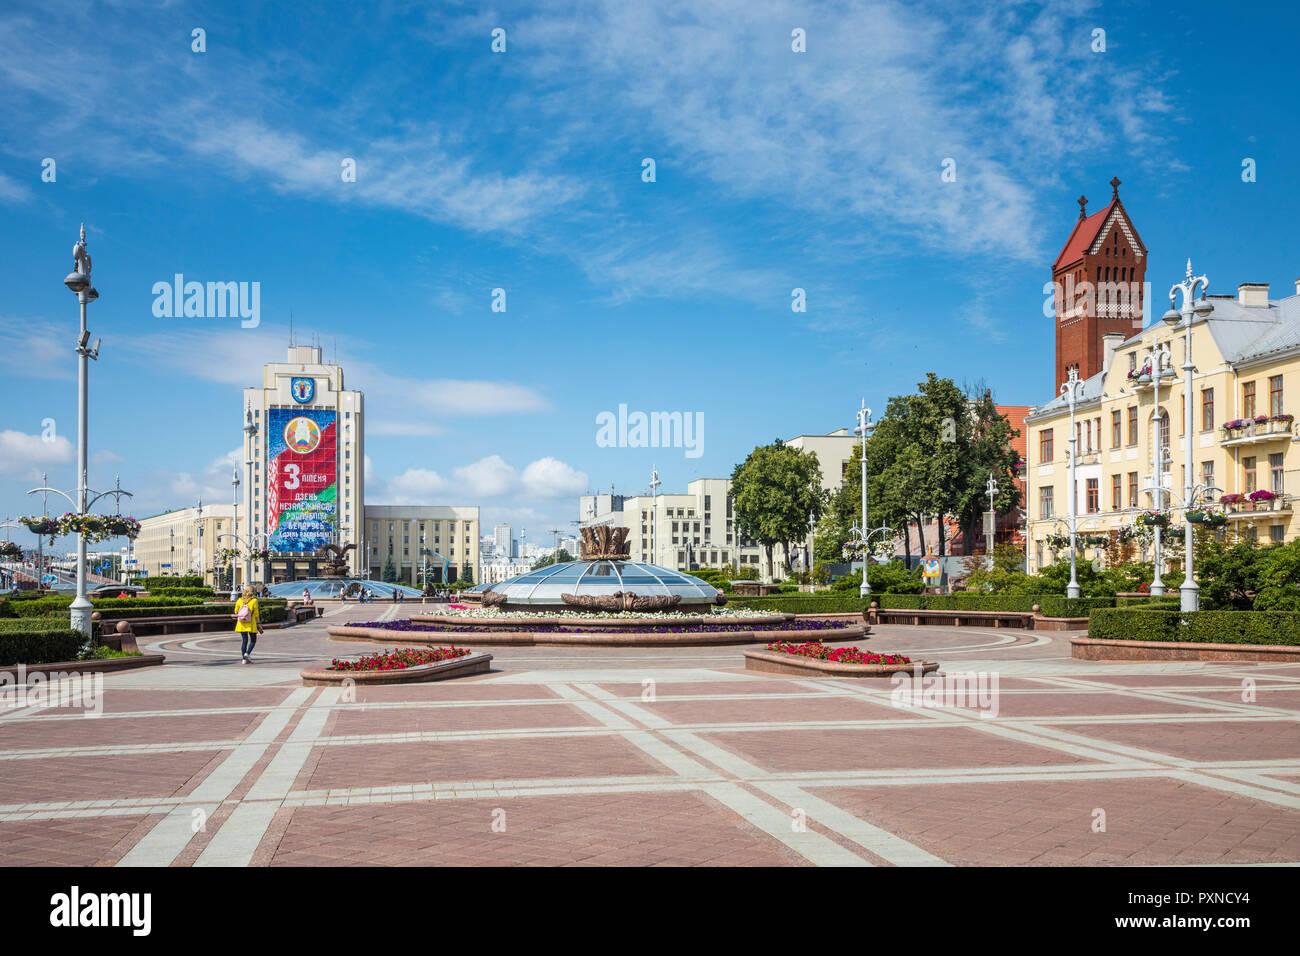 Independence Square, Minsk, Belarus Stock Photo